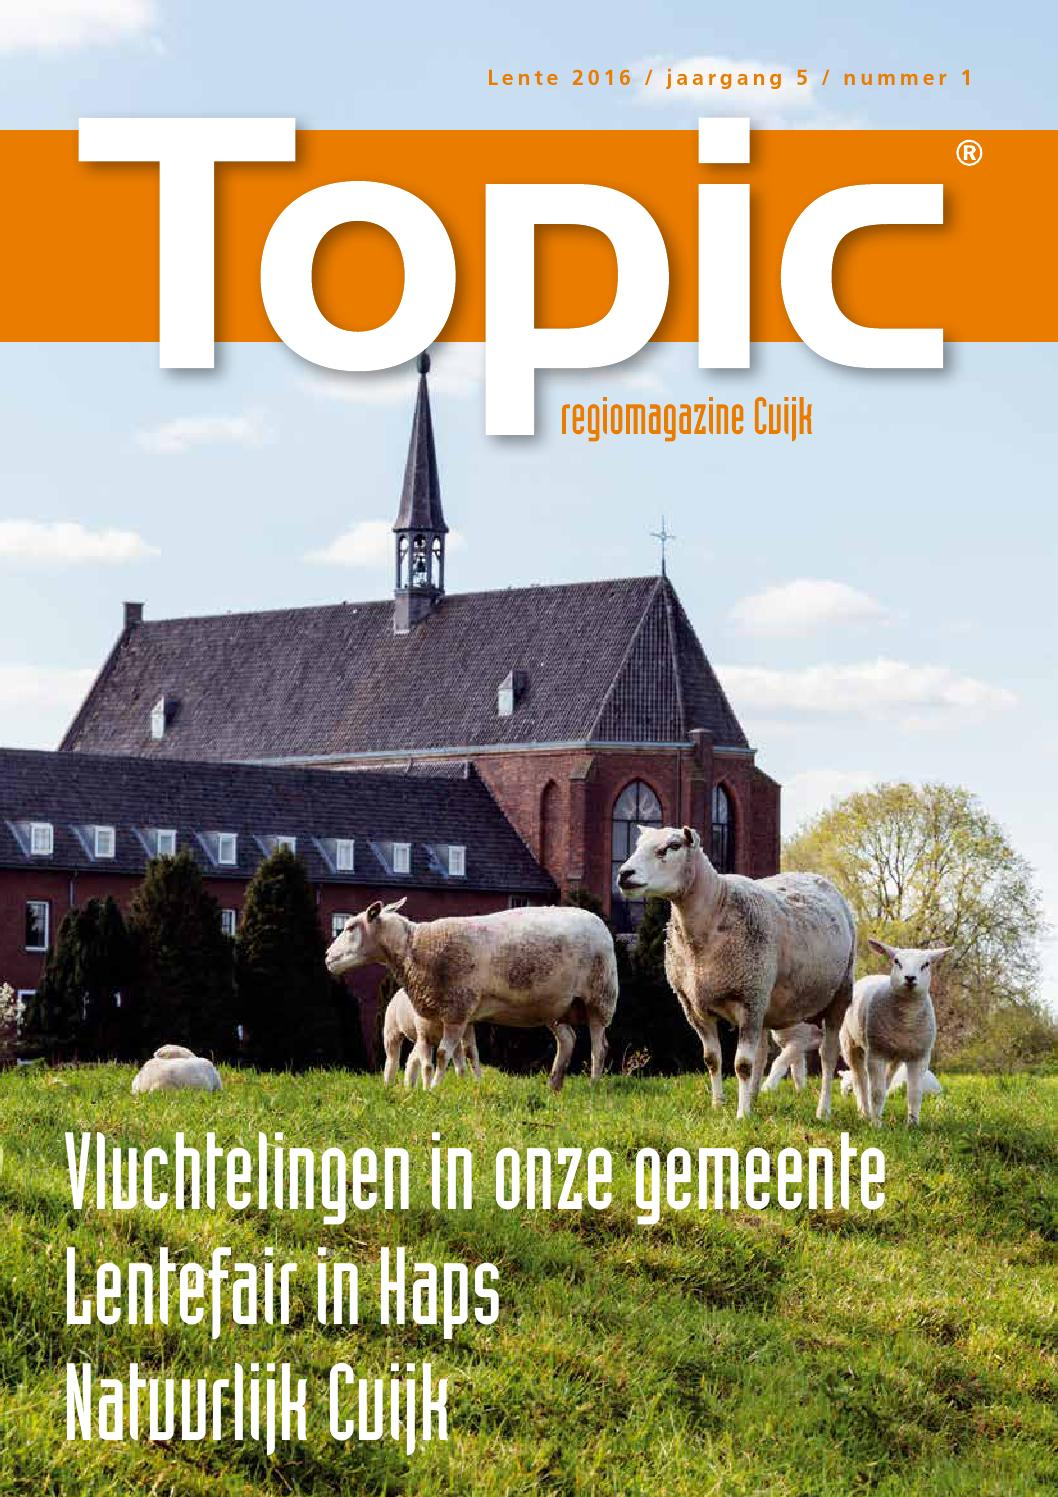 Topic Cuijk Lente 2016 by Remi van Bergen - issuu